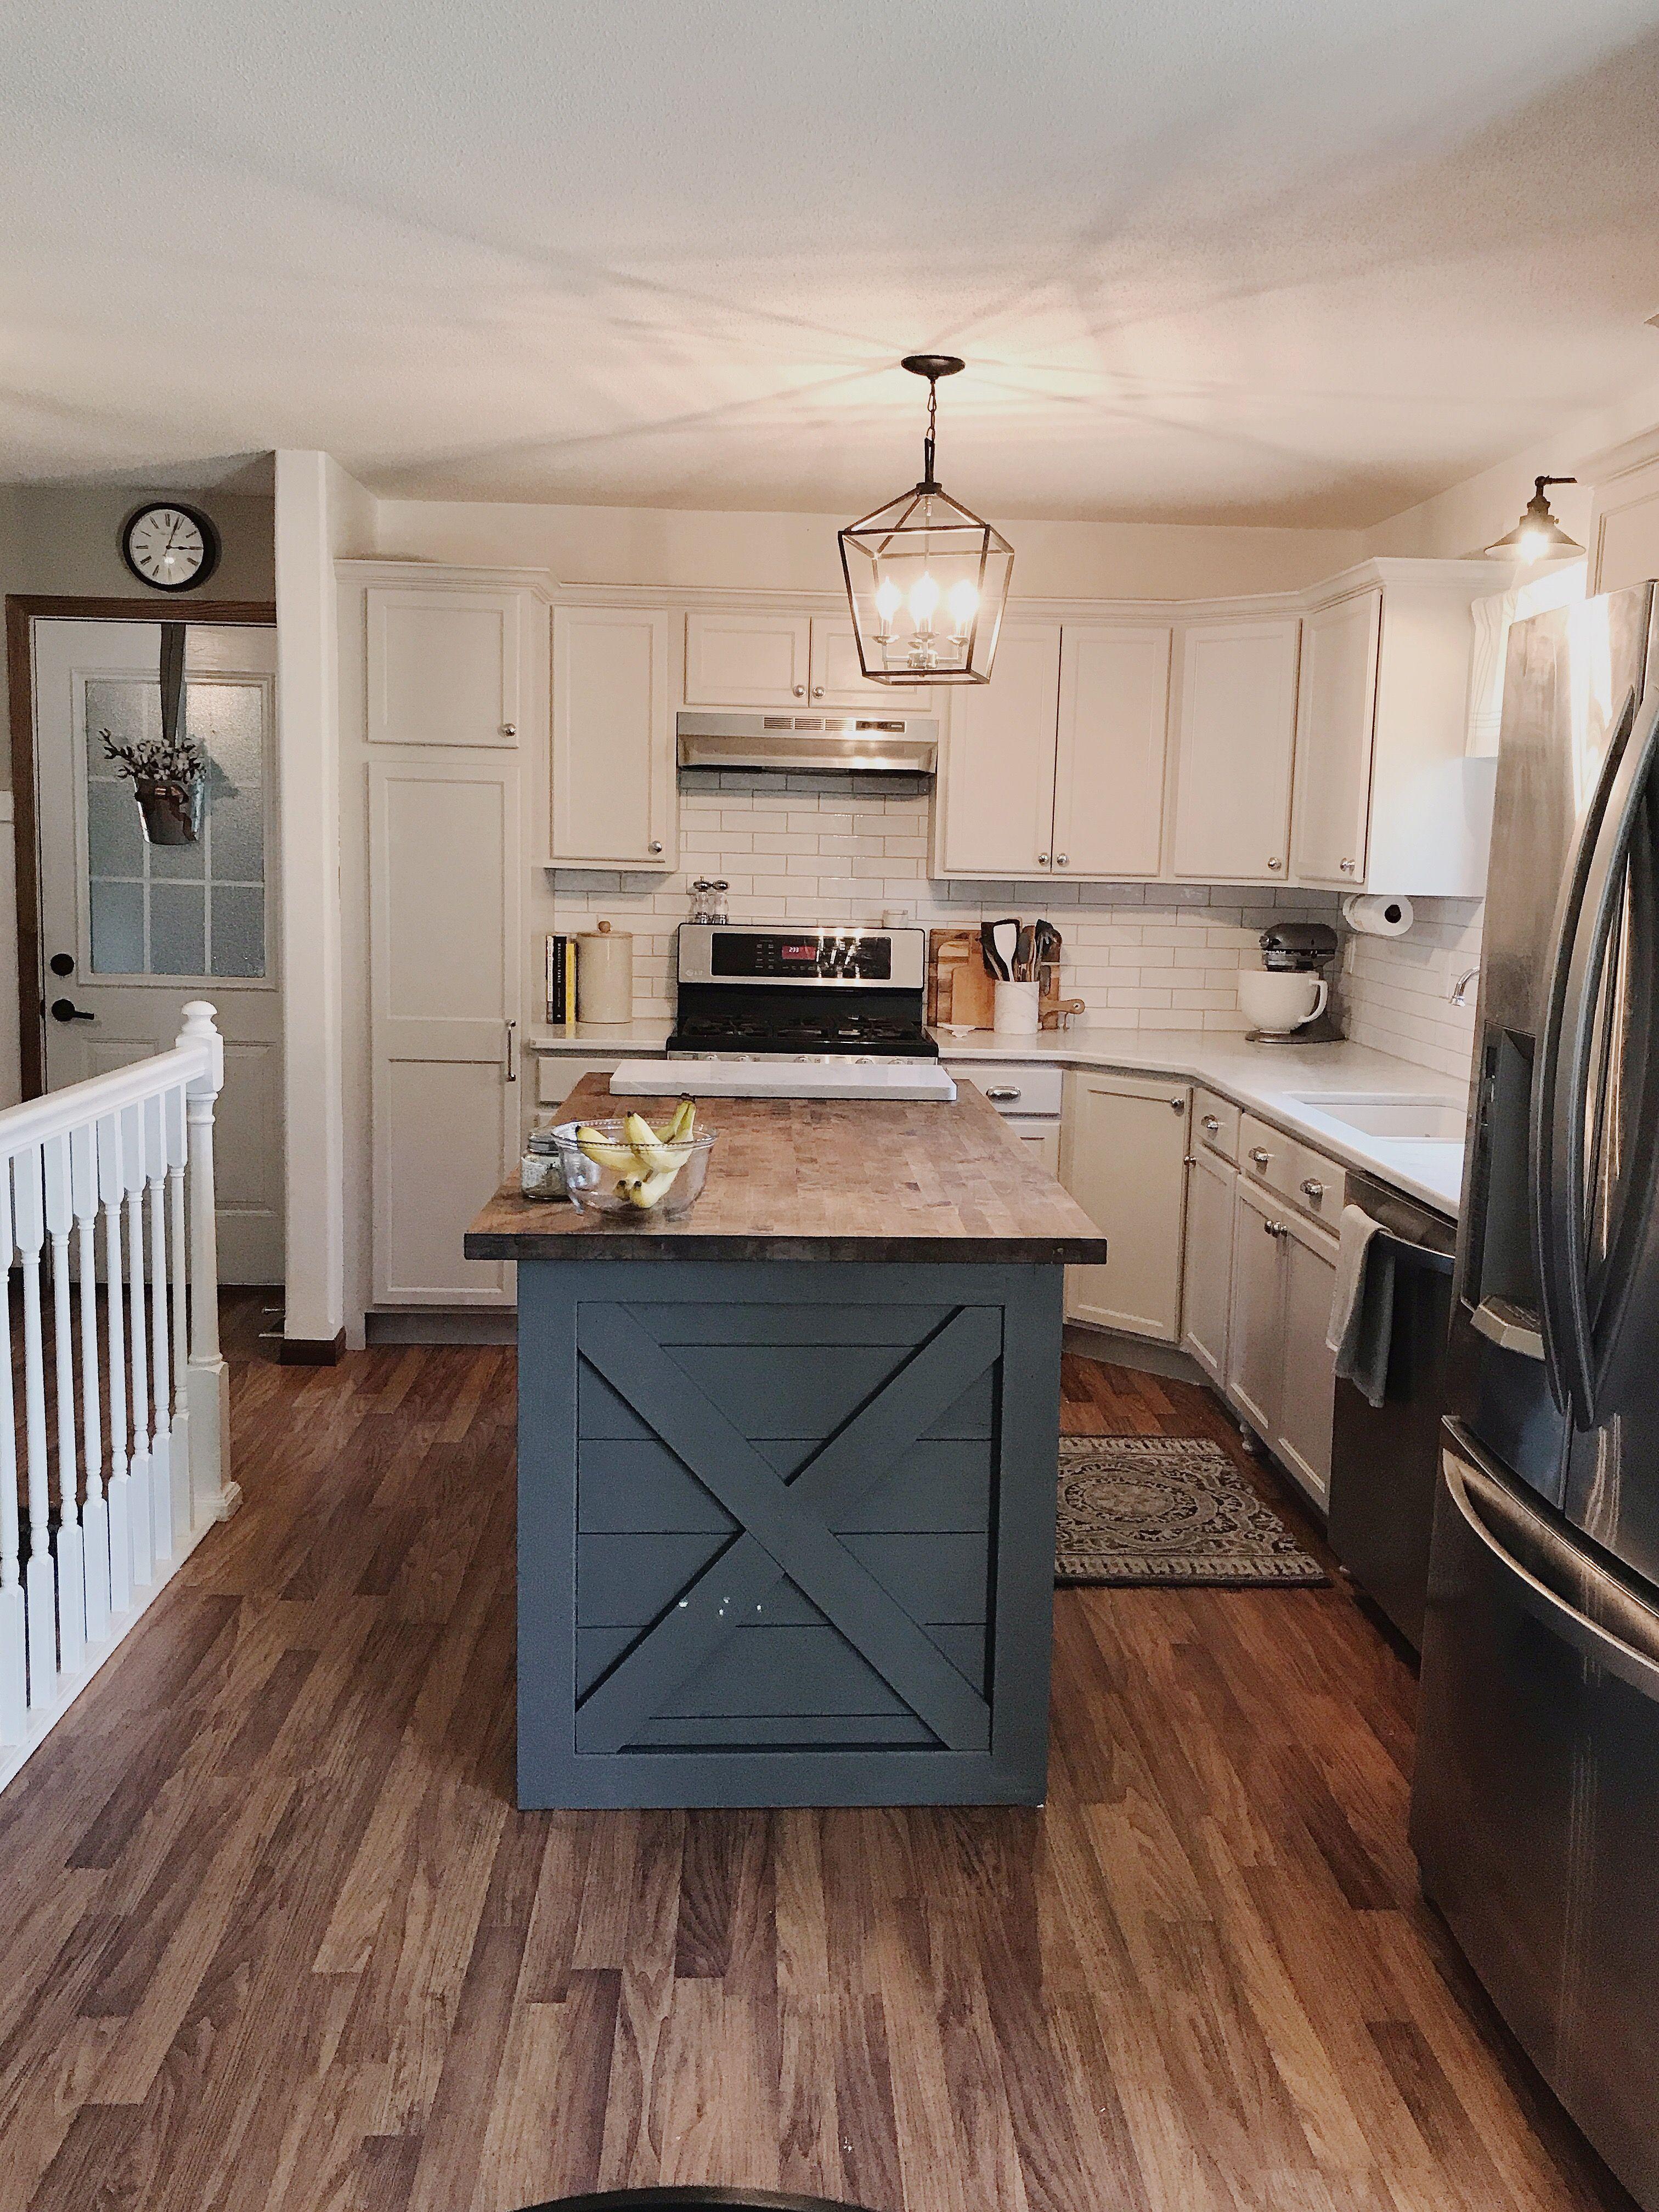 Kitchen island diy slate tile by sherwin williams